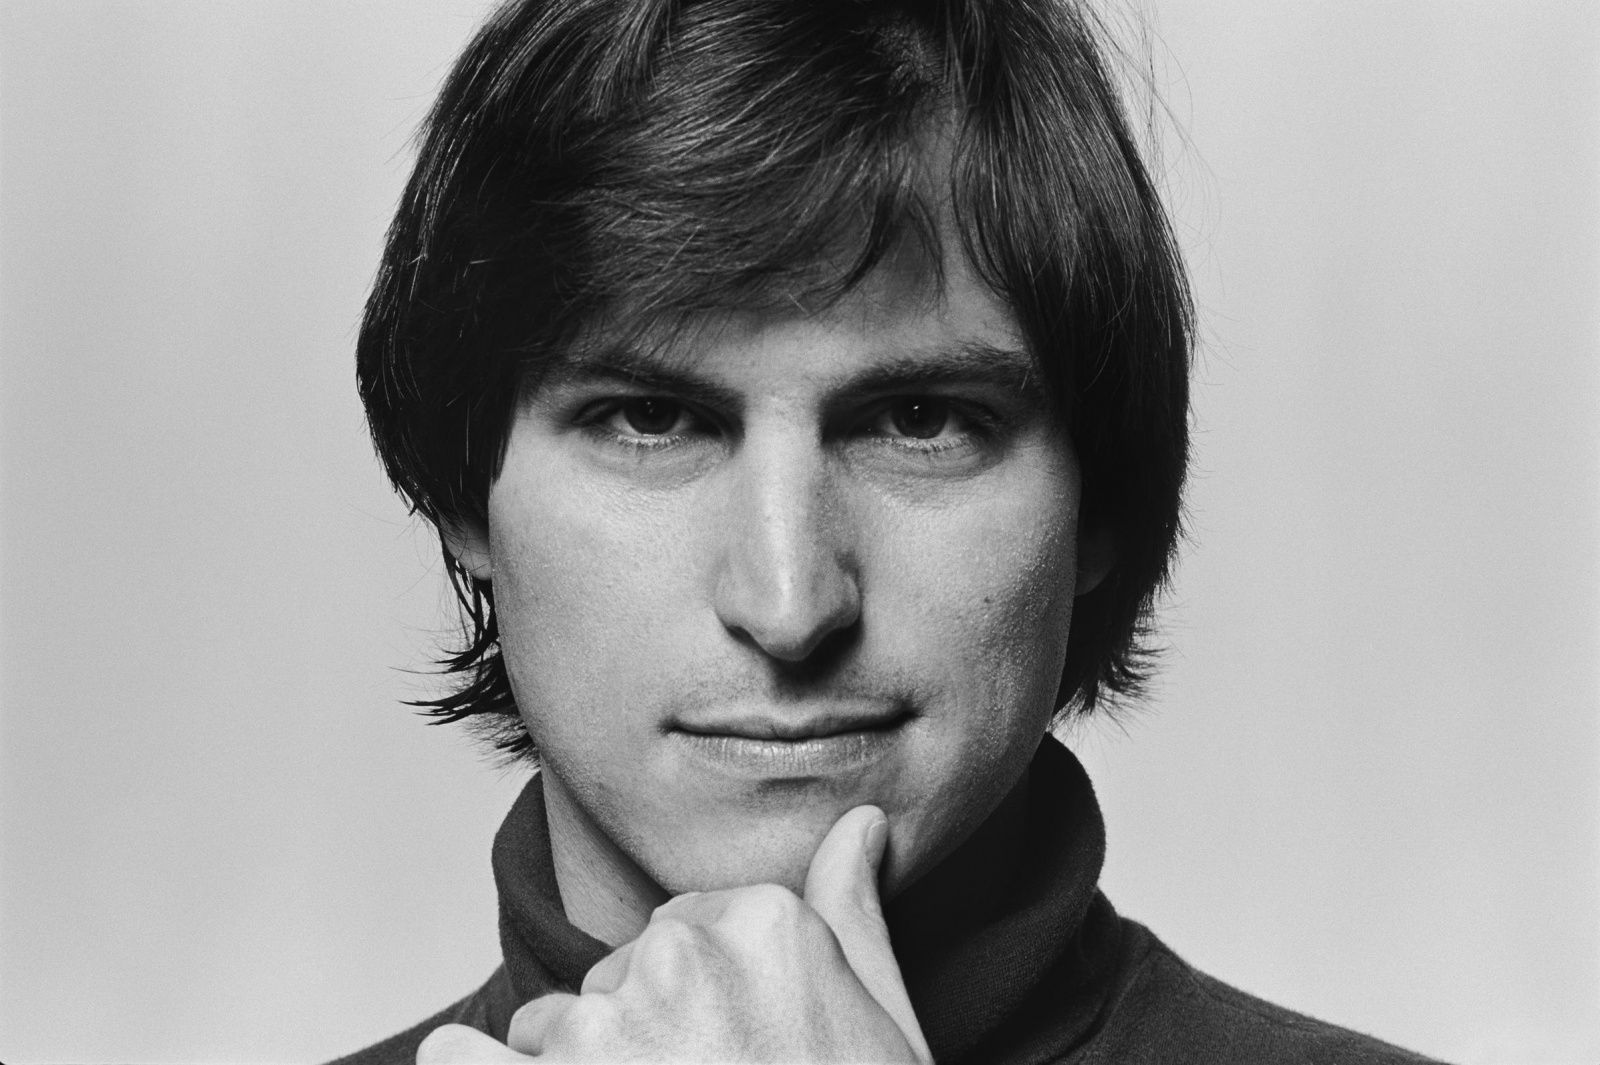 Steve Jobs bland